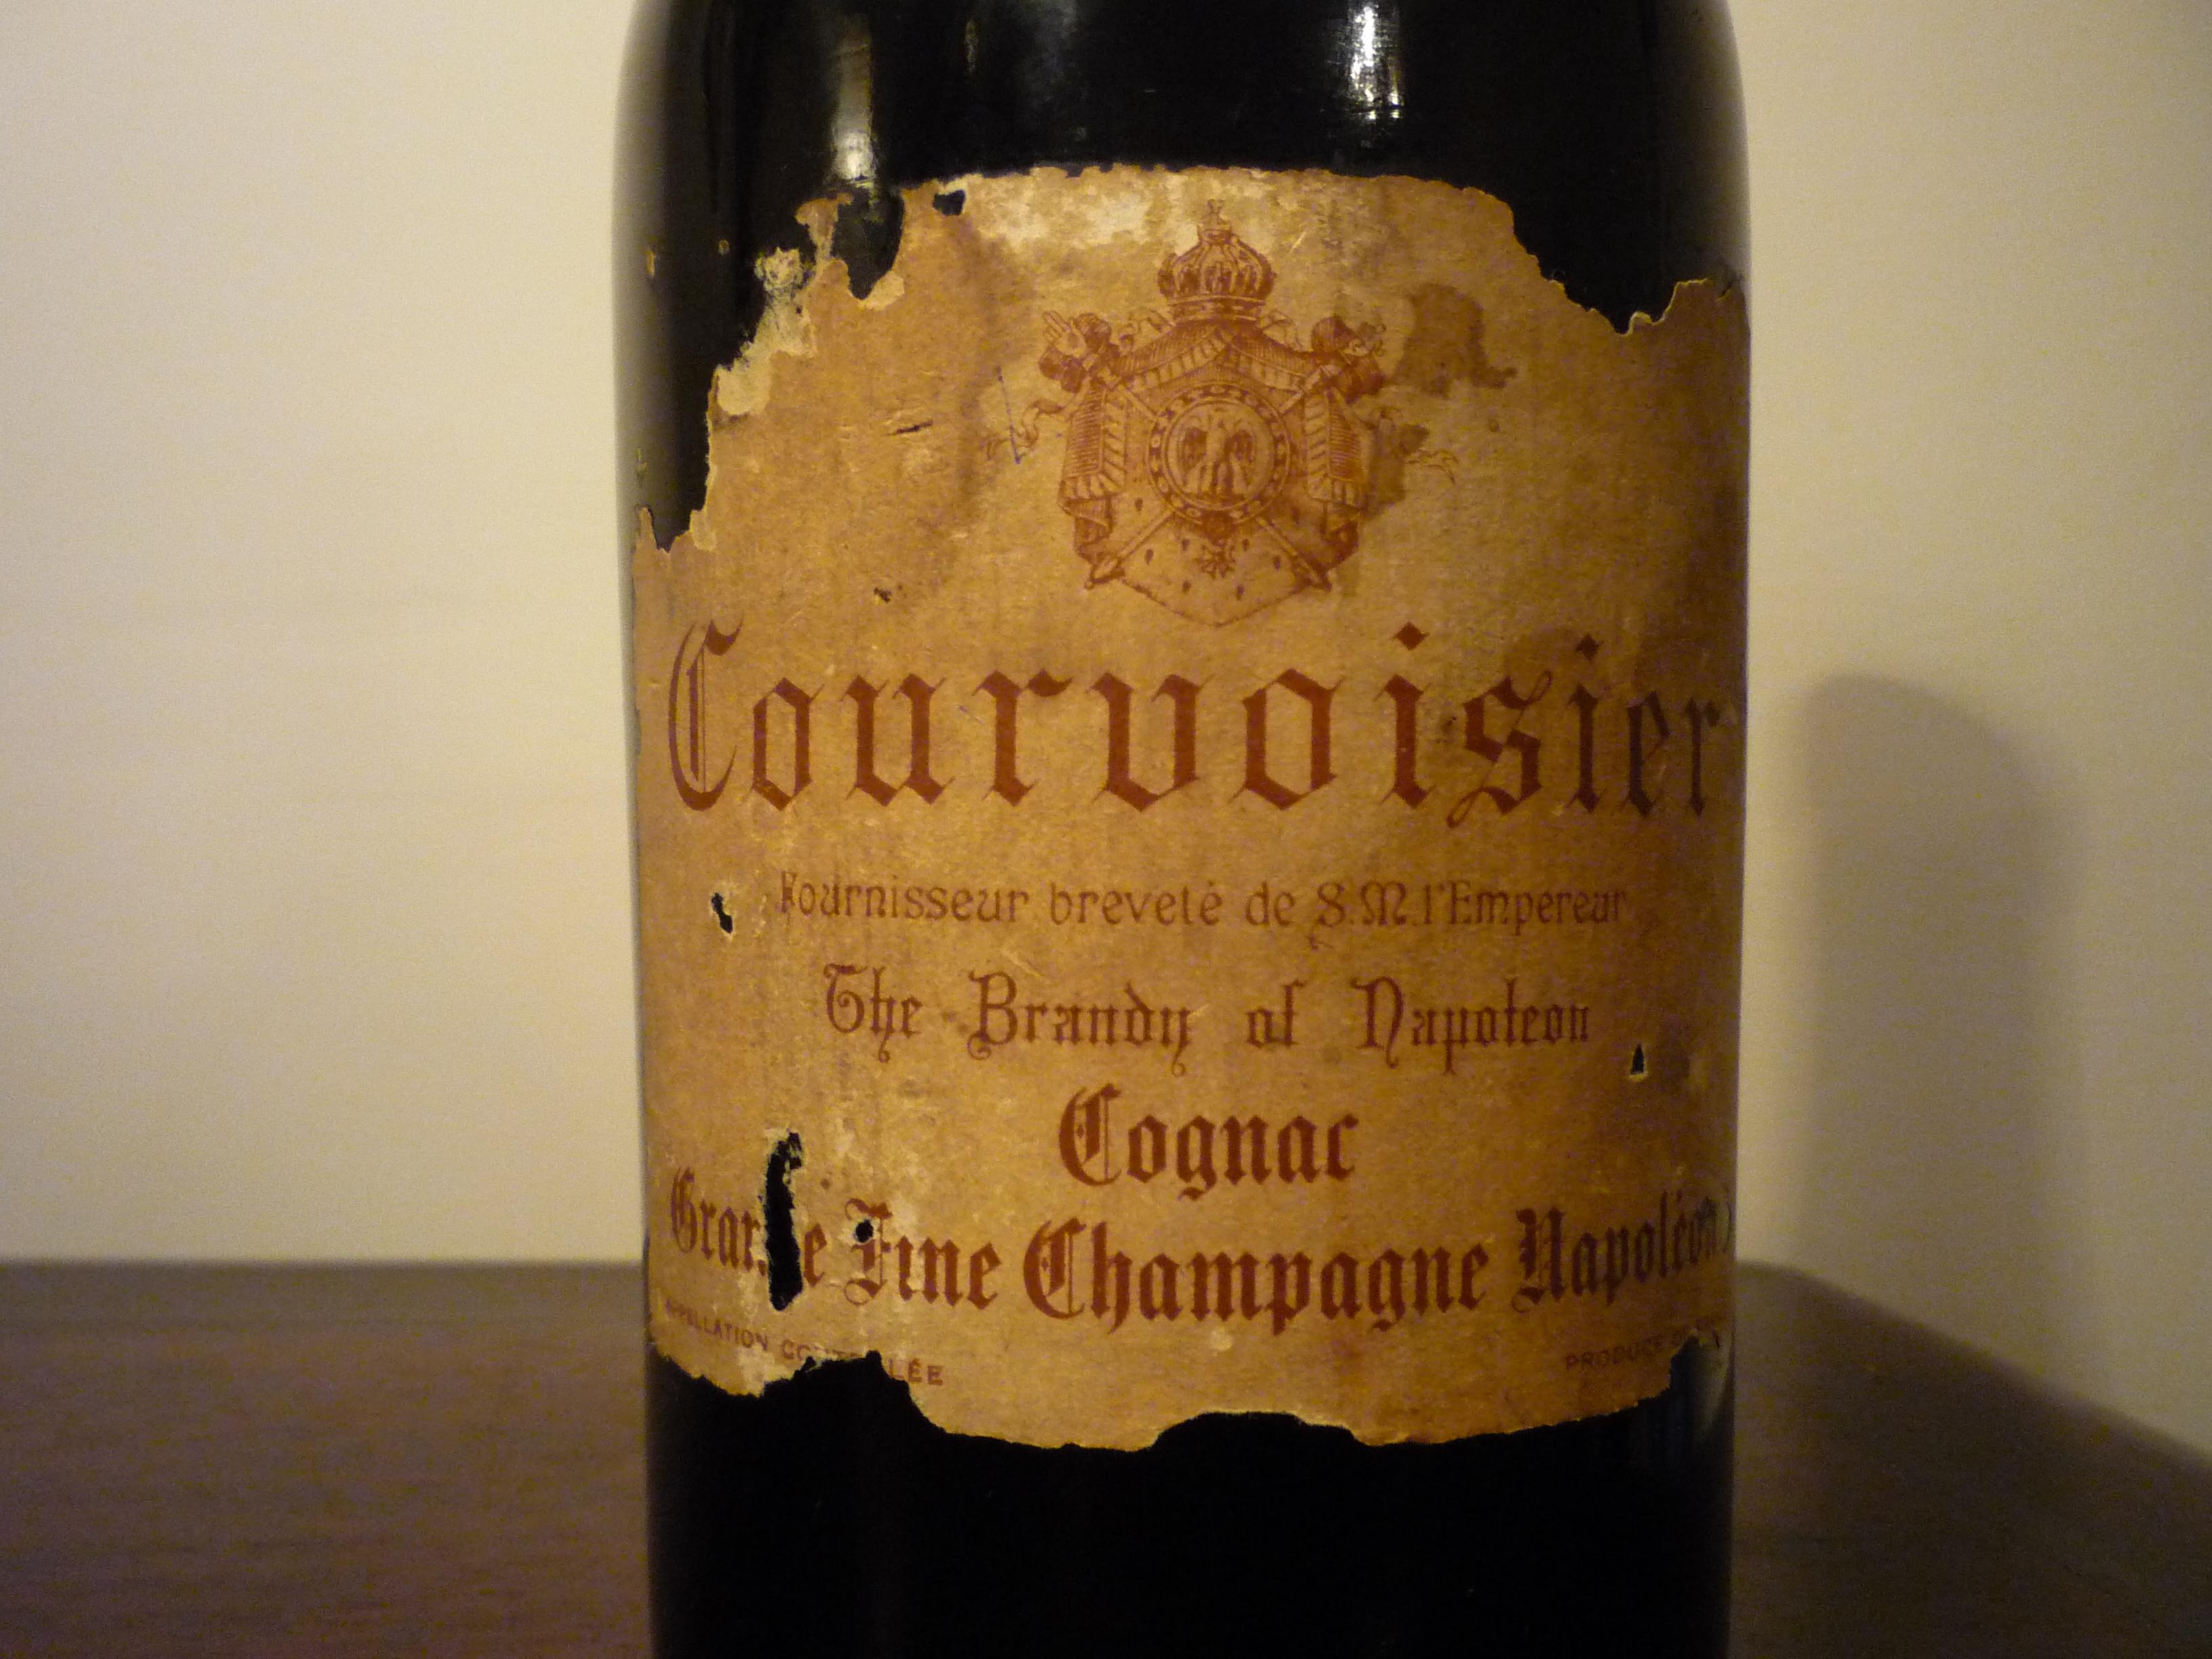 Courvoisier Fine Champagne